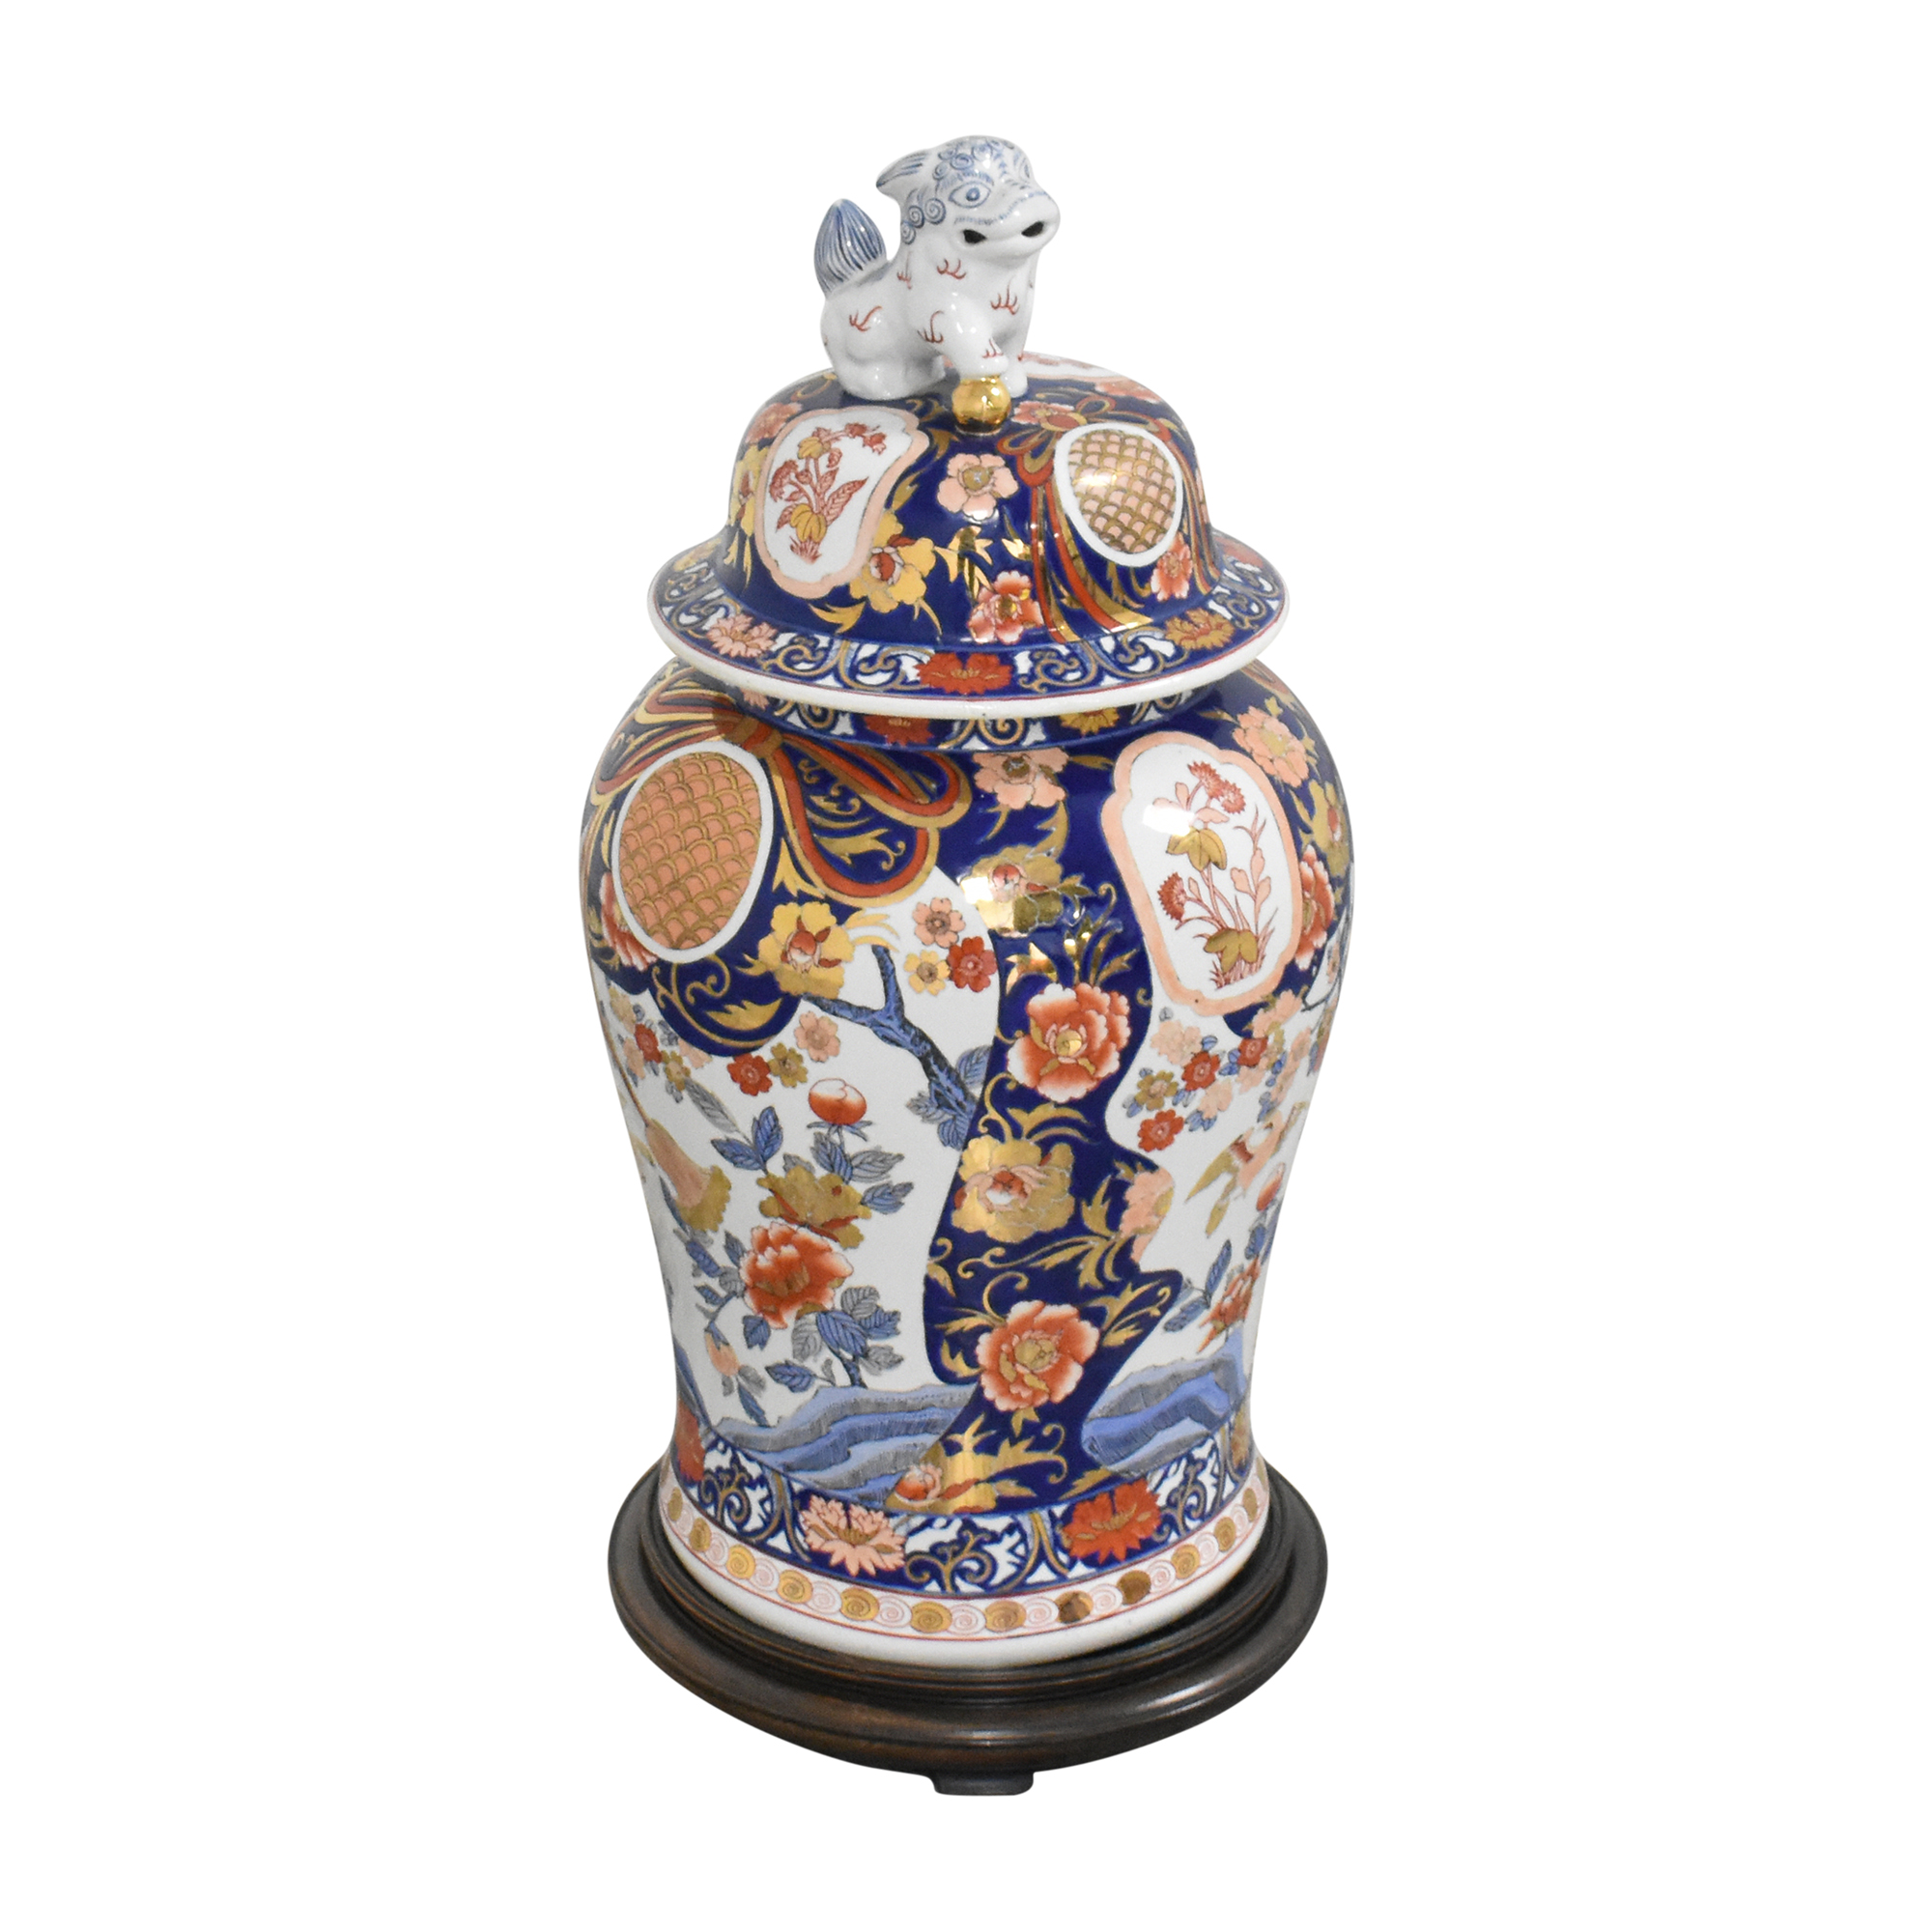 shop Maitland-Smith Maitland-Smith Decorative Vase online